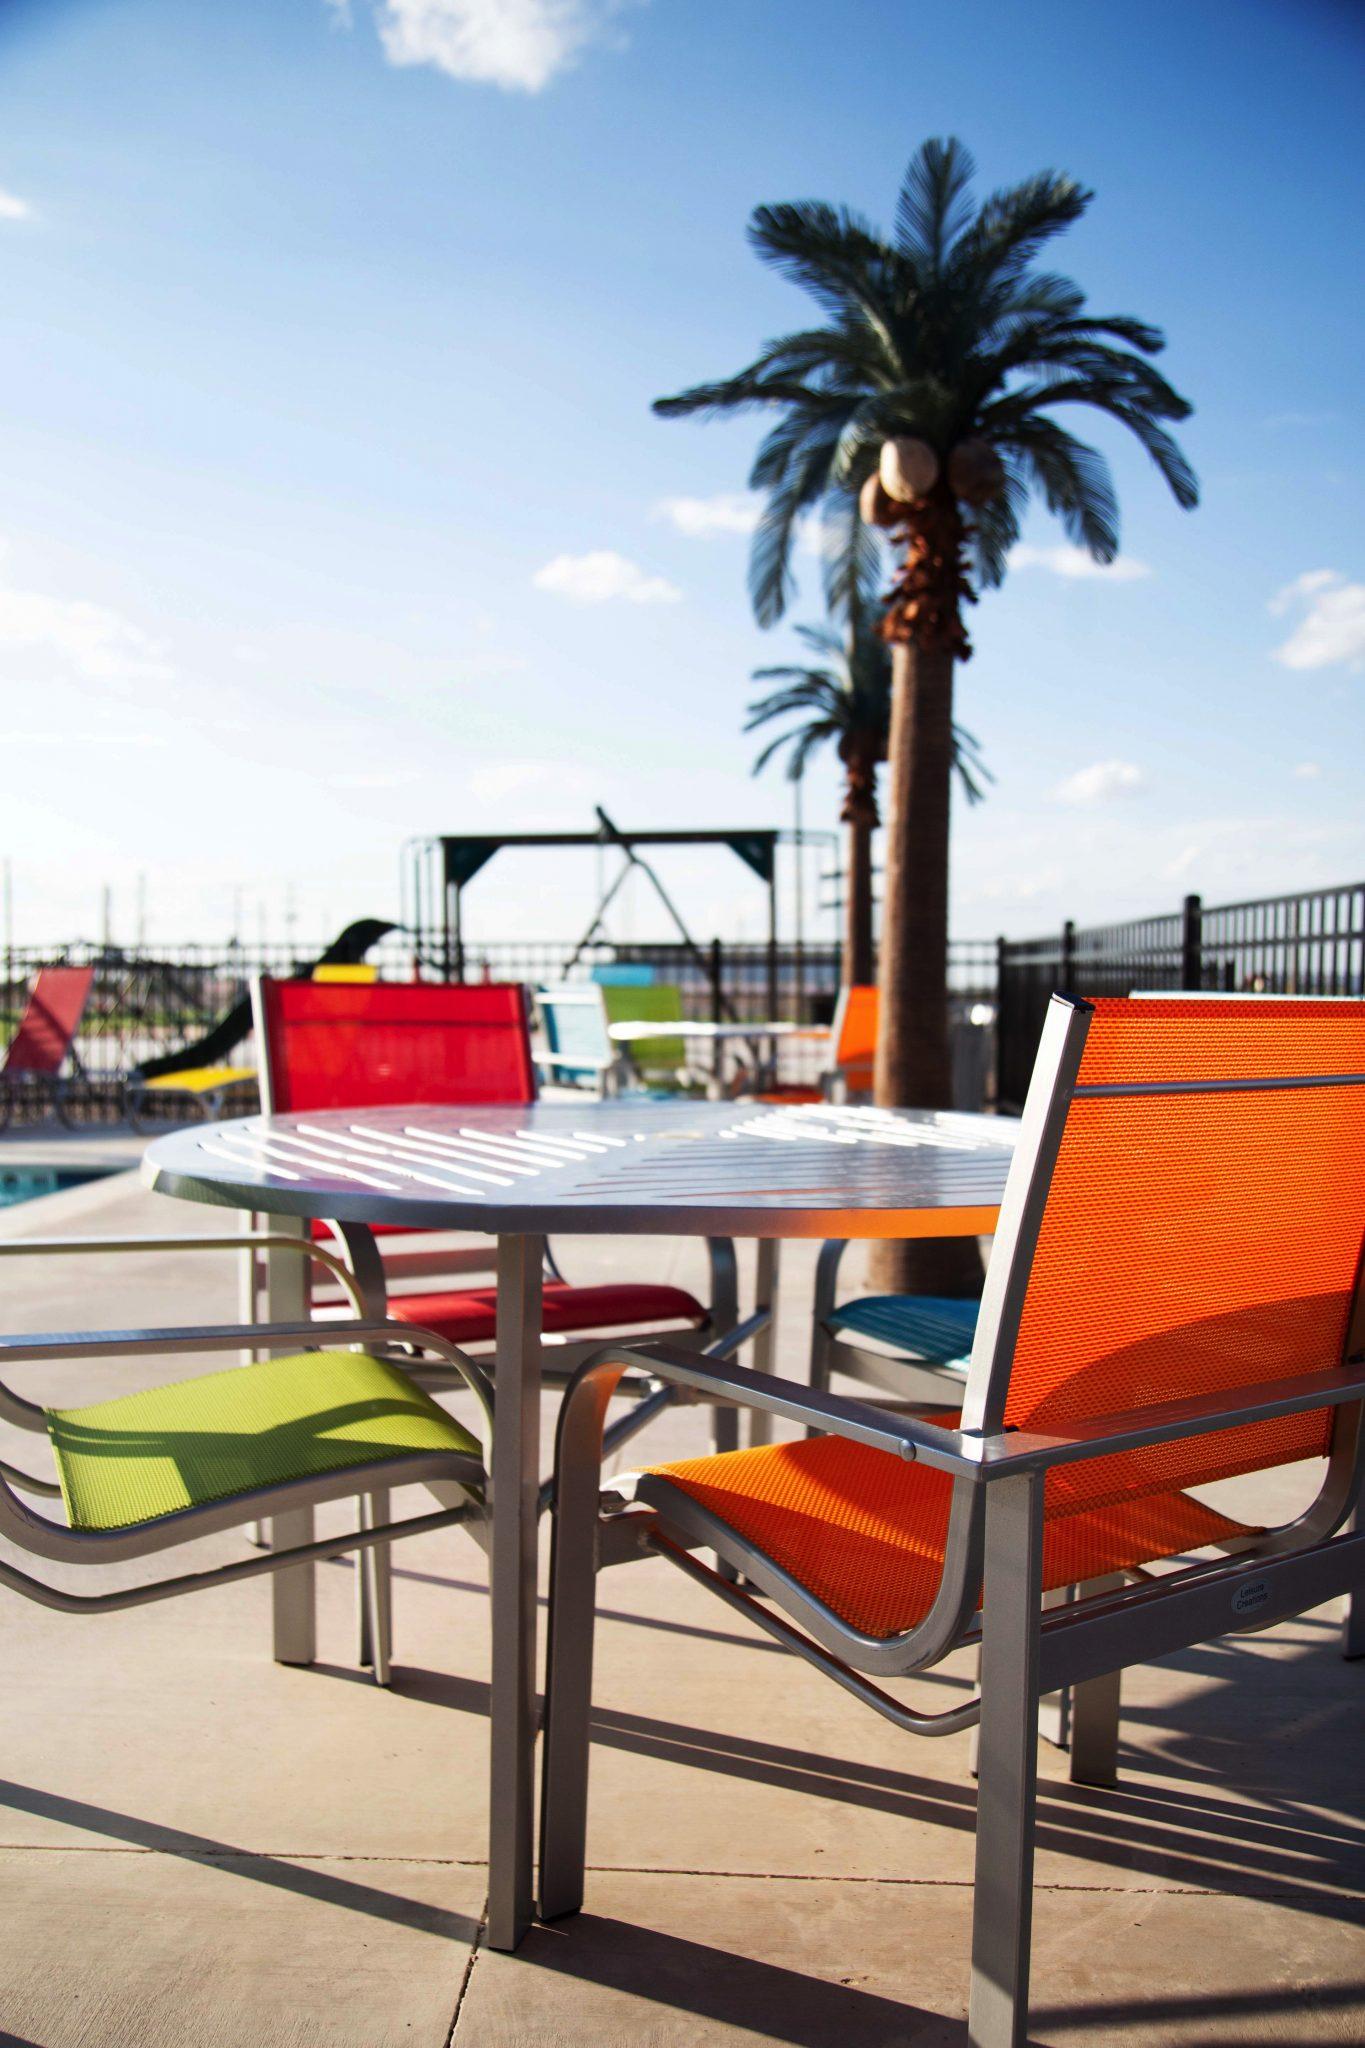 Park Place RV Park Odessa, TX 79766 - poolside